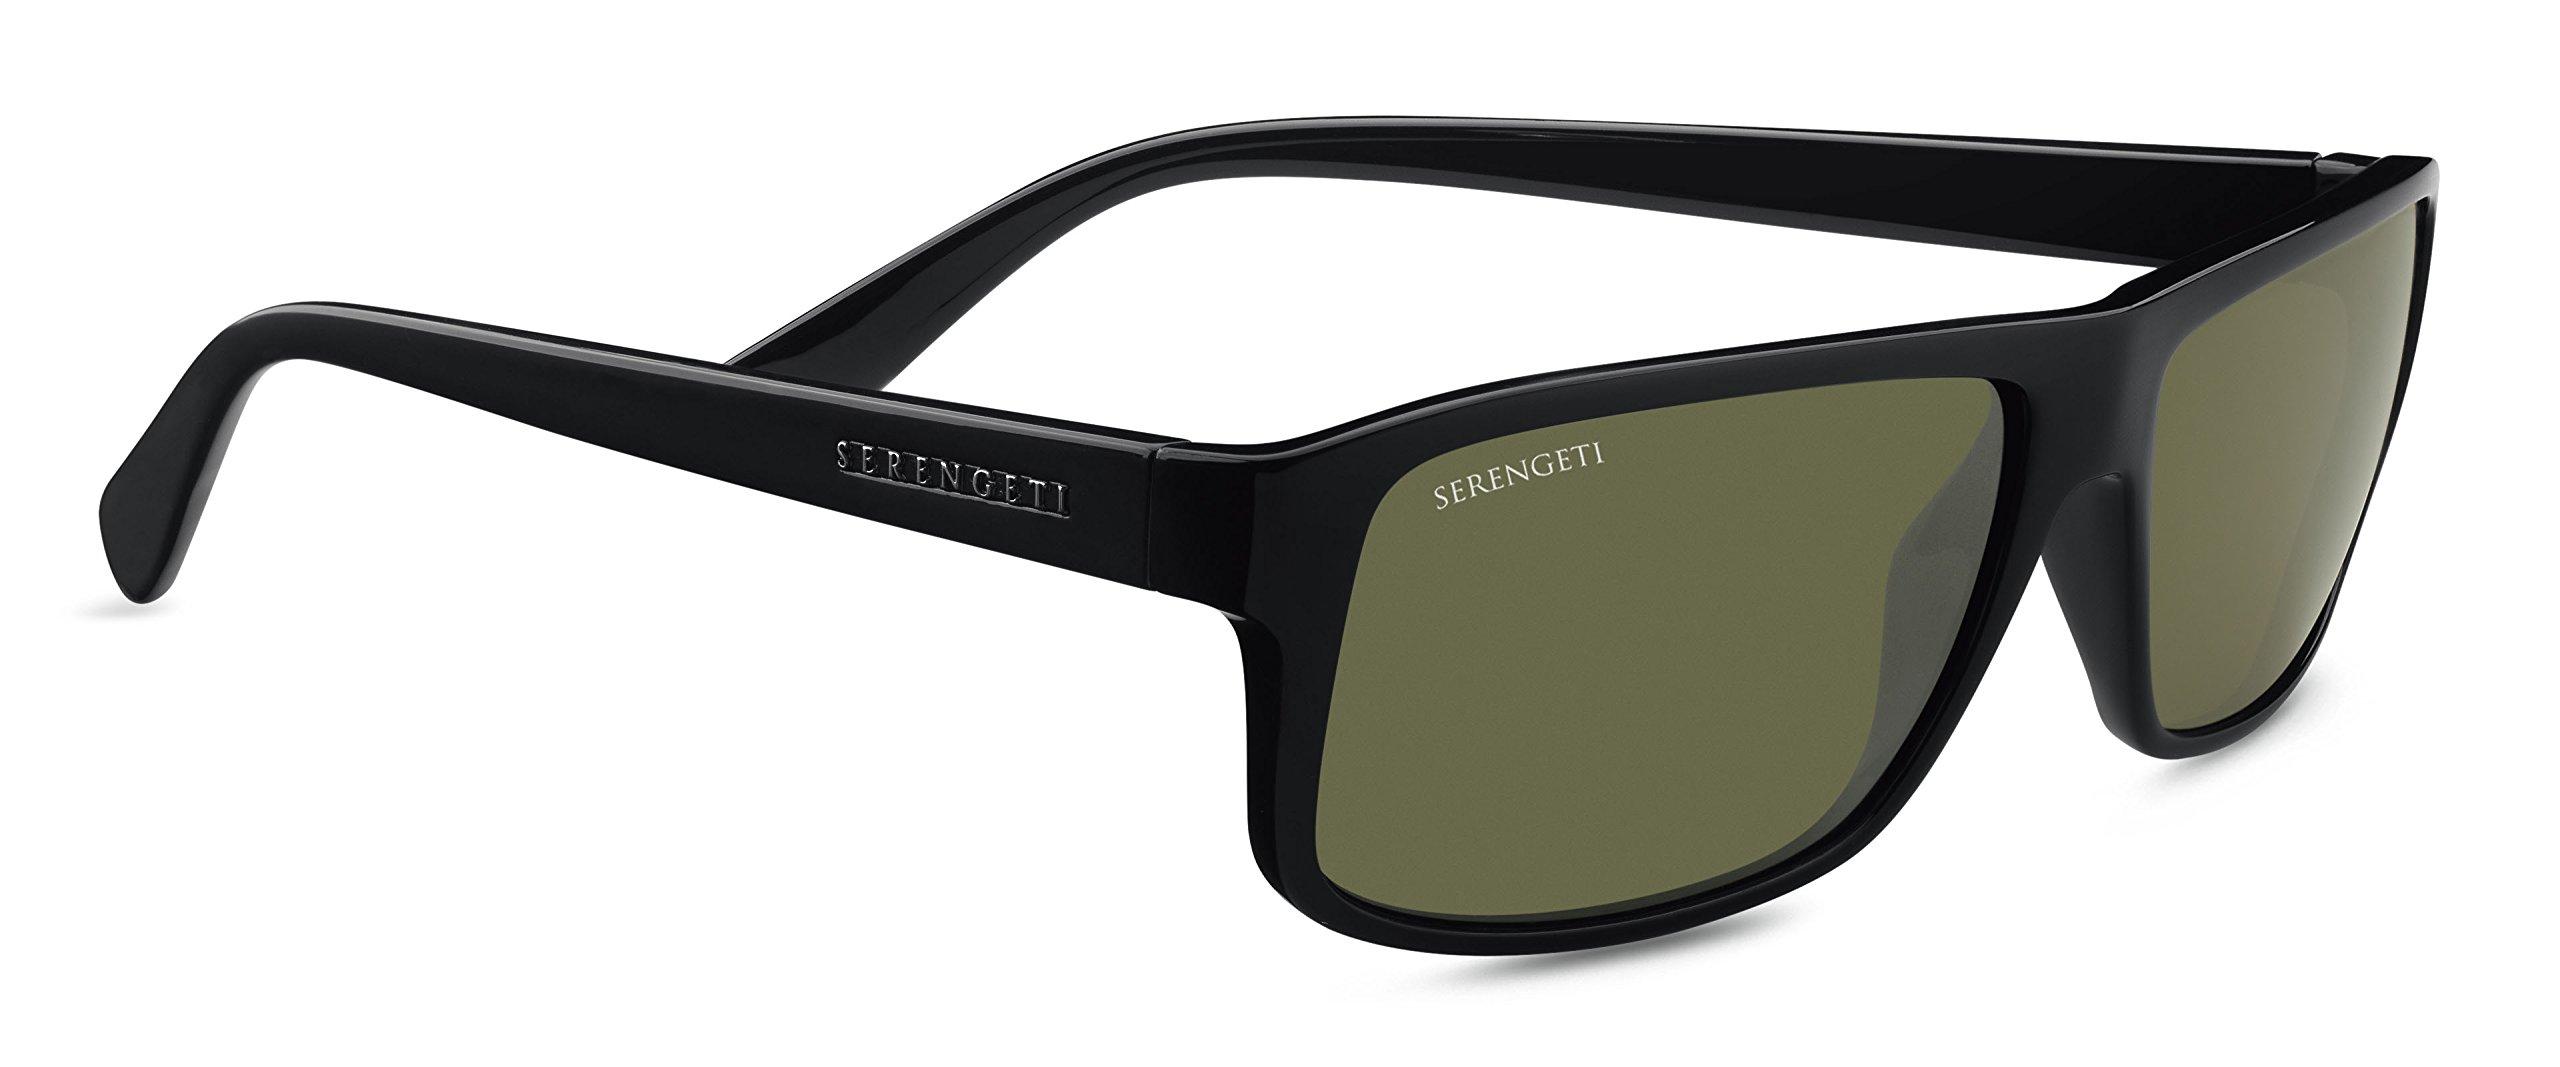 Serengeti Sassari Sunglasses Pro-Motion Distributing Direct 7664